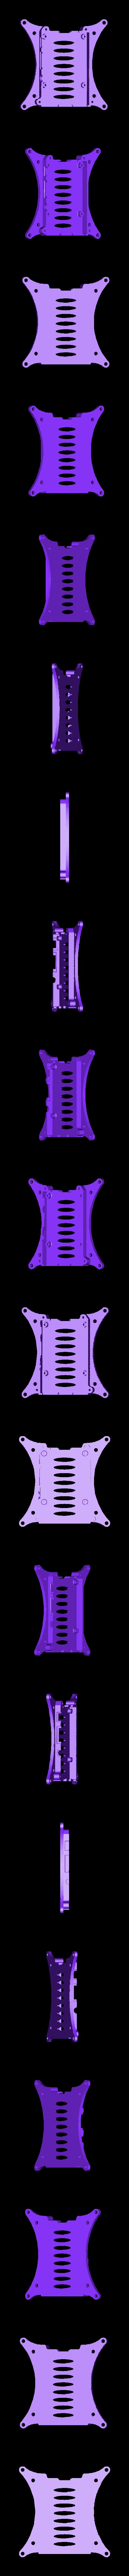 rpi3-bottom_100mm-vesa_netfabb.stl Télécharger fichier STL gratuit Coffret Framboise Pi 3 (B/B+), Pi 2 B et Pi 1 B+ avec supports VESA et plus. • Objet imprimable en 3D, Aralala